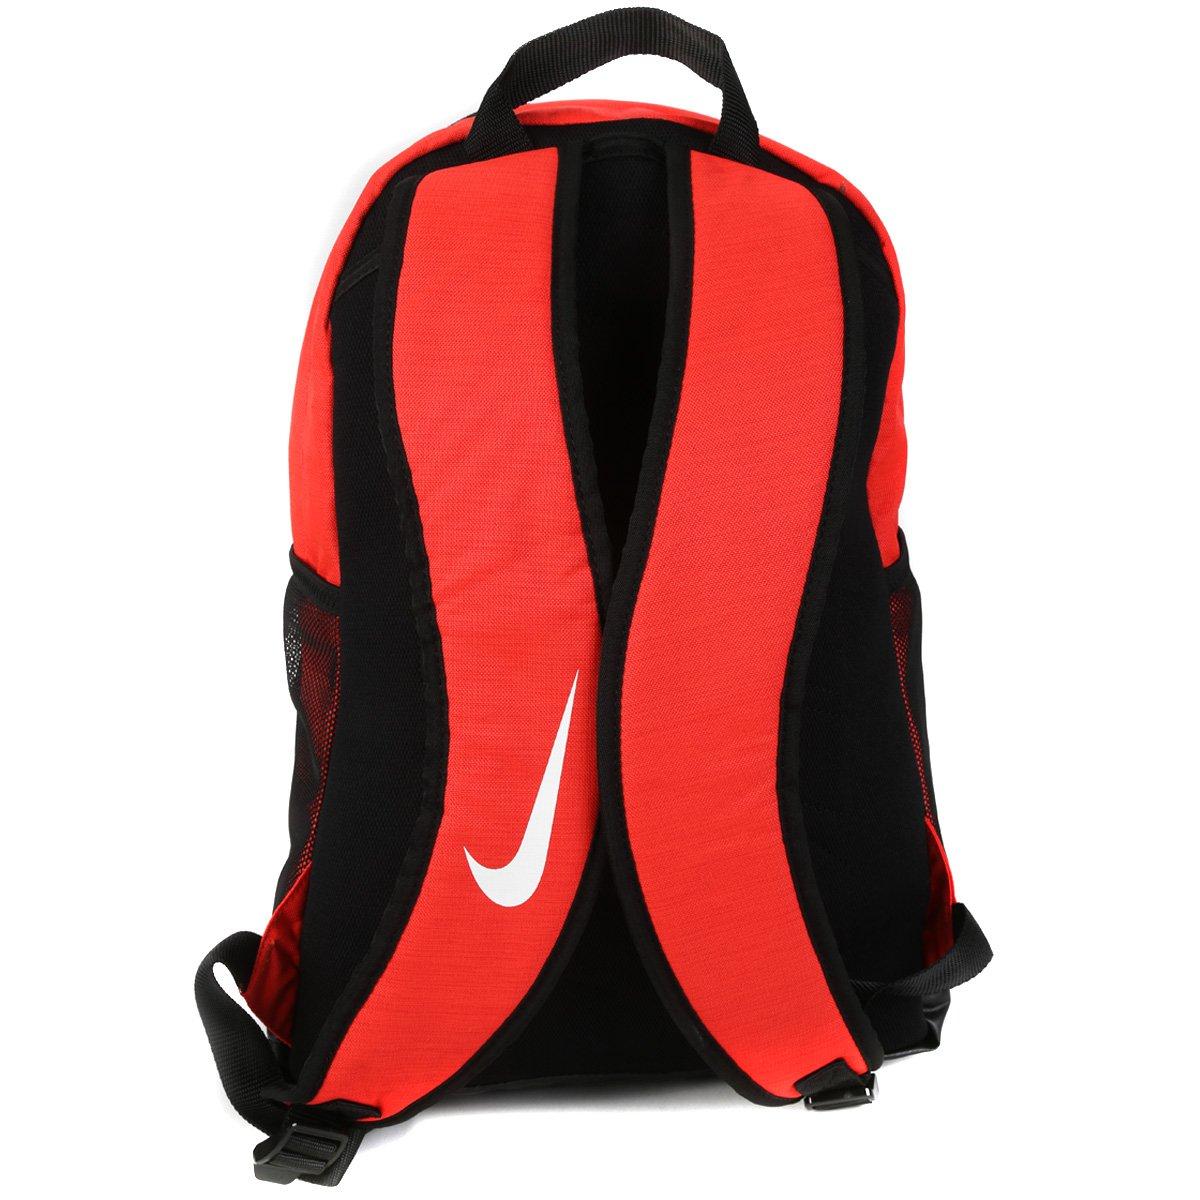 Mochila Nike Brasília - Laranja e Preto - Compre Agora  587bd4d1ee403